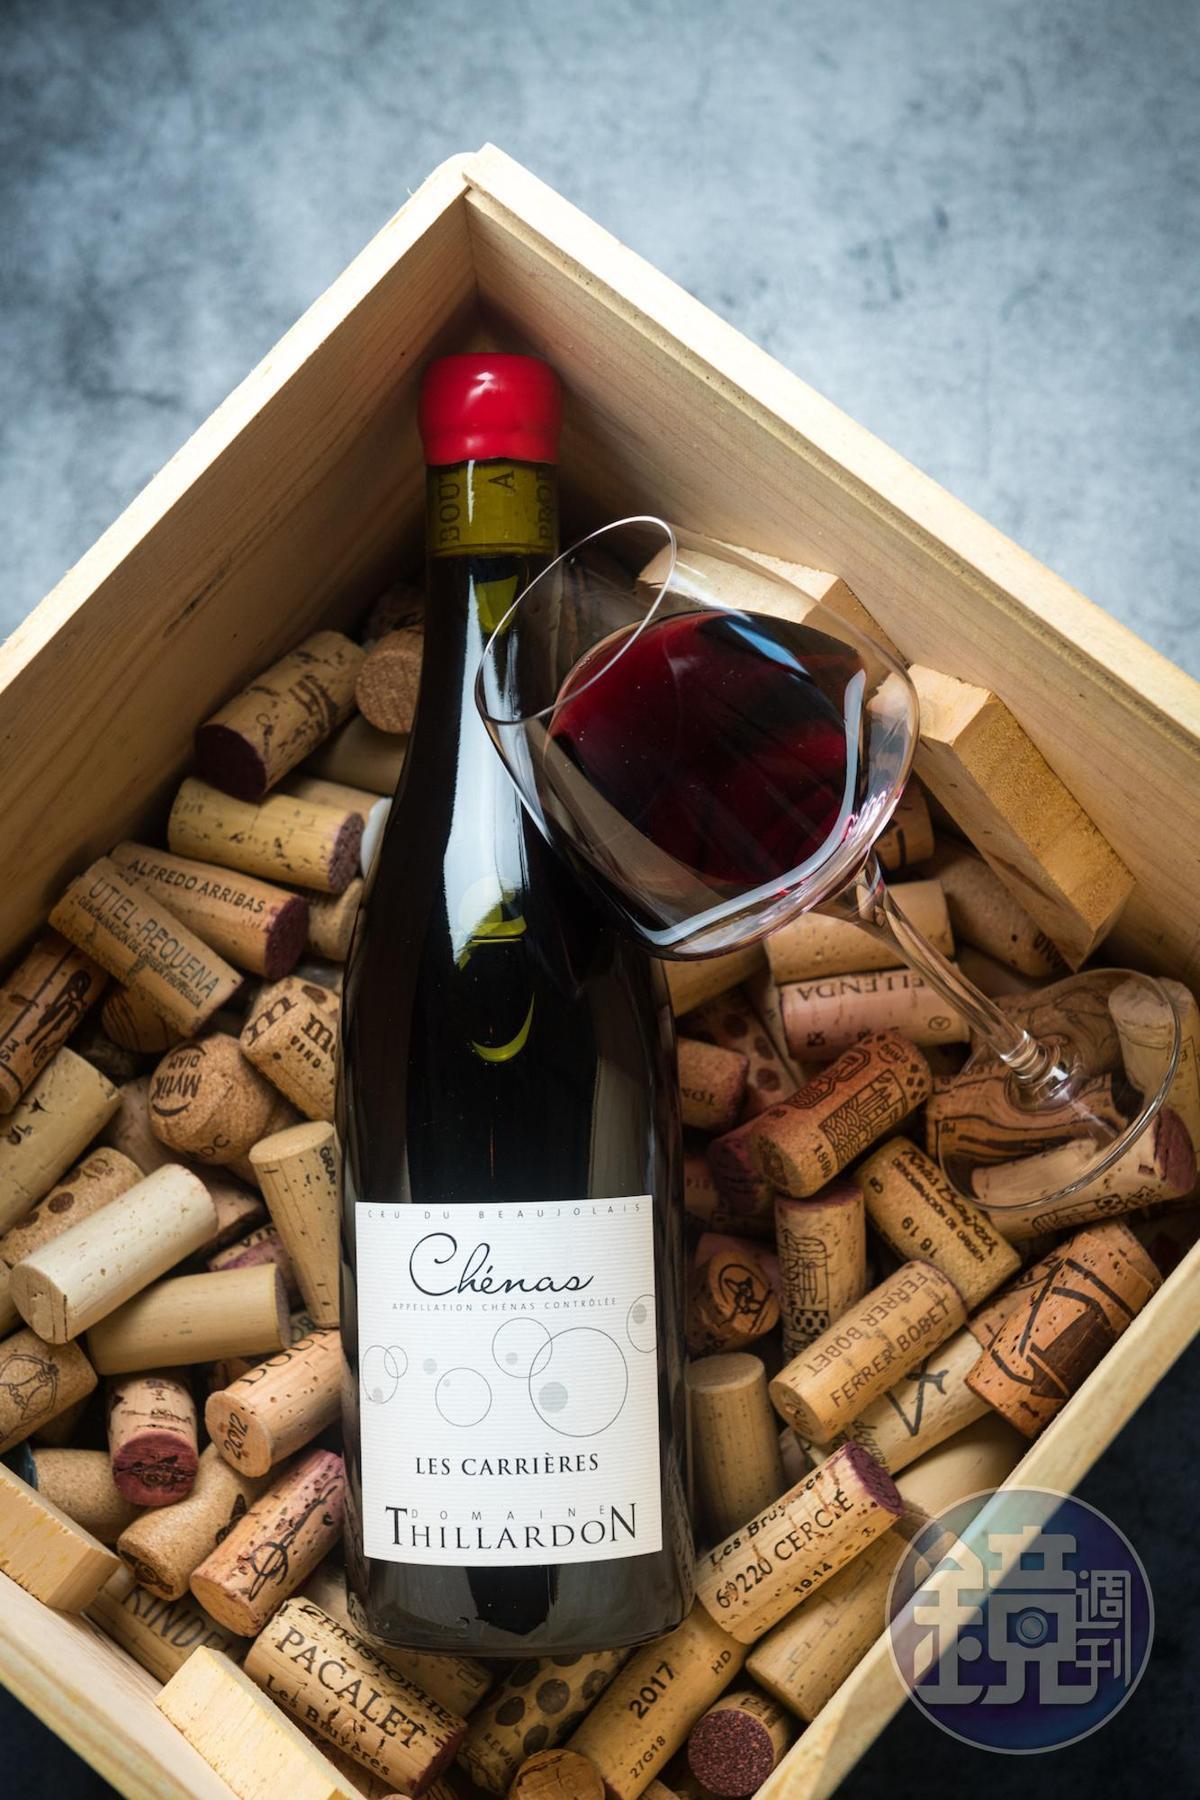 「Chénas Les Carrières' Domaine Thillardon 2018」是自然派薄酒萊的代表,鮮美可口。(1,200元/瓶,代理商:維納瑞)